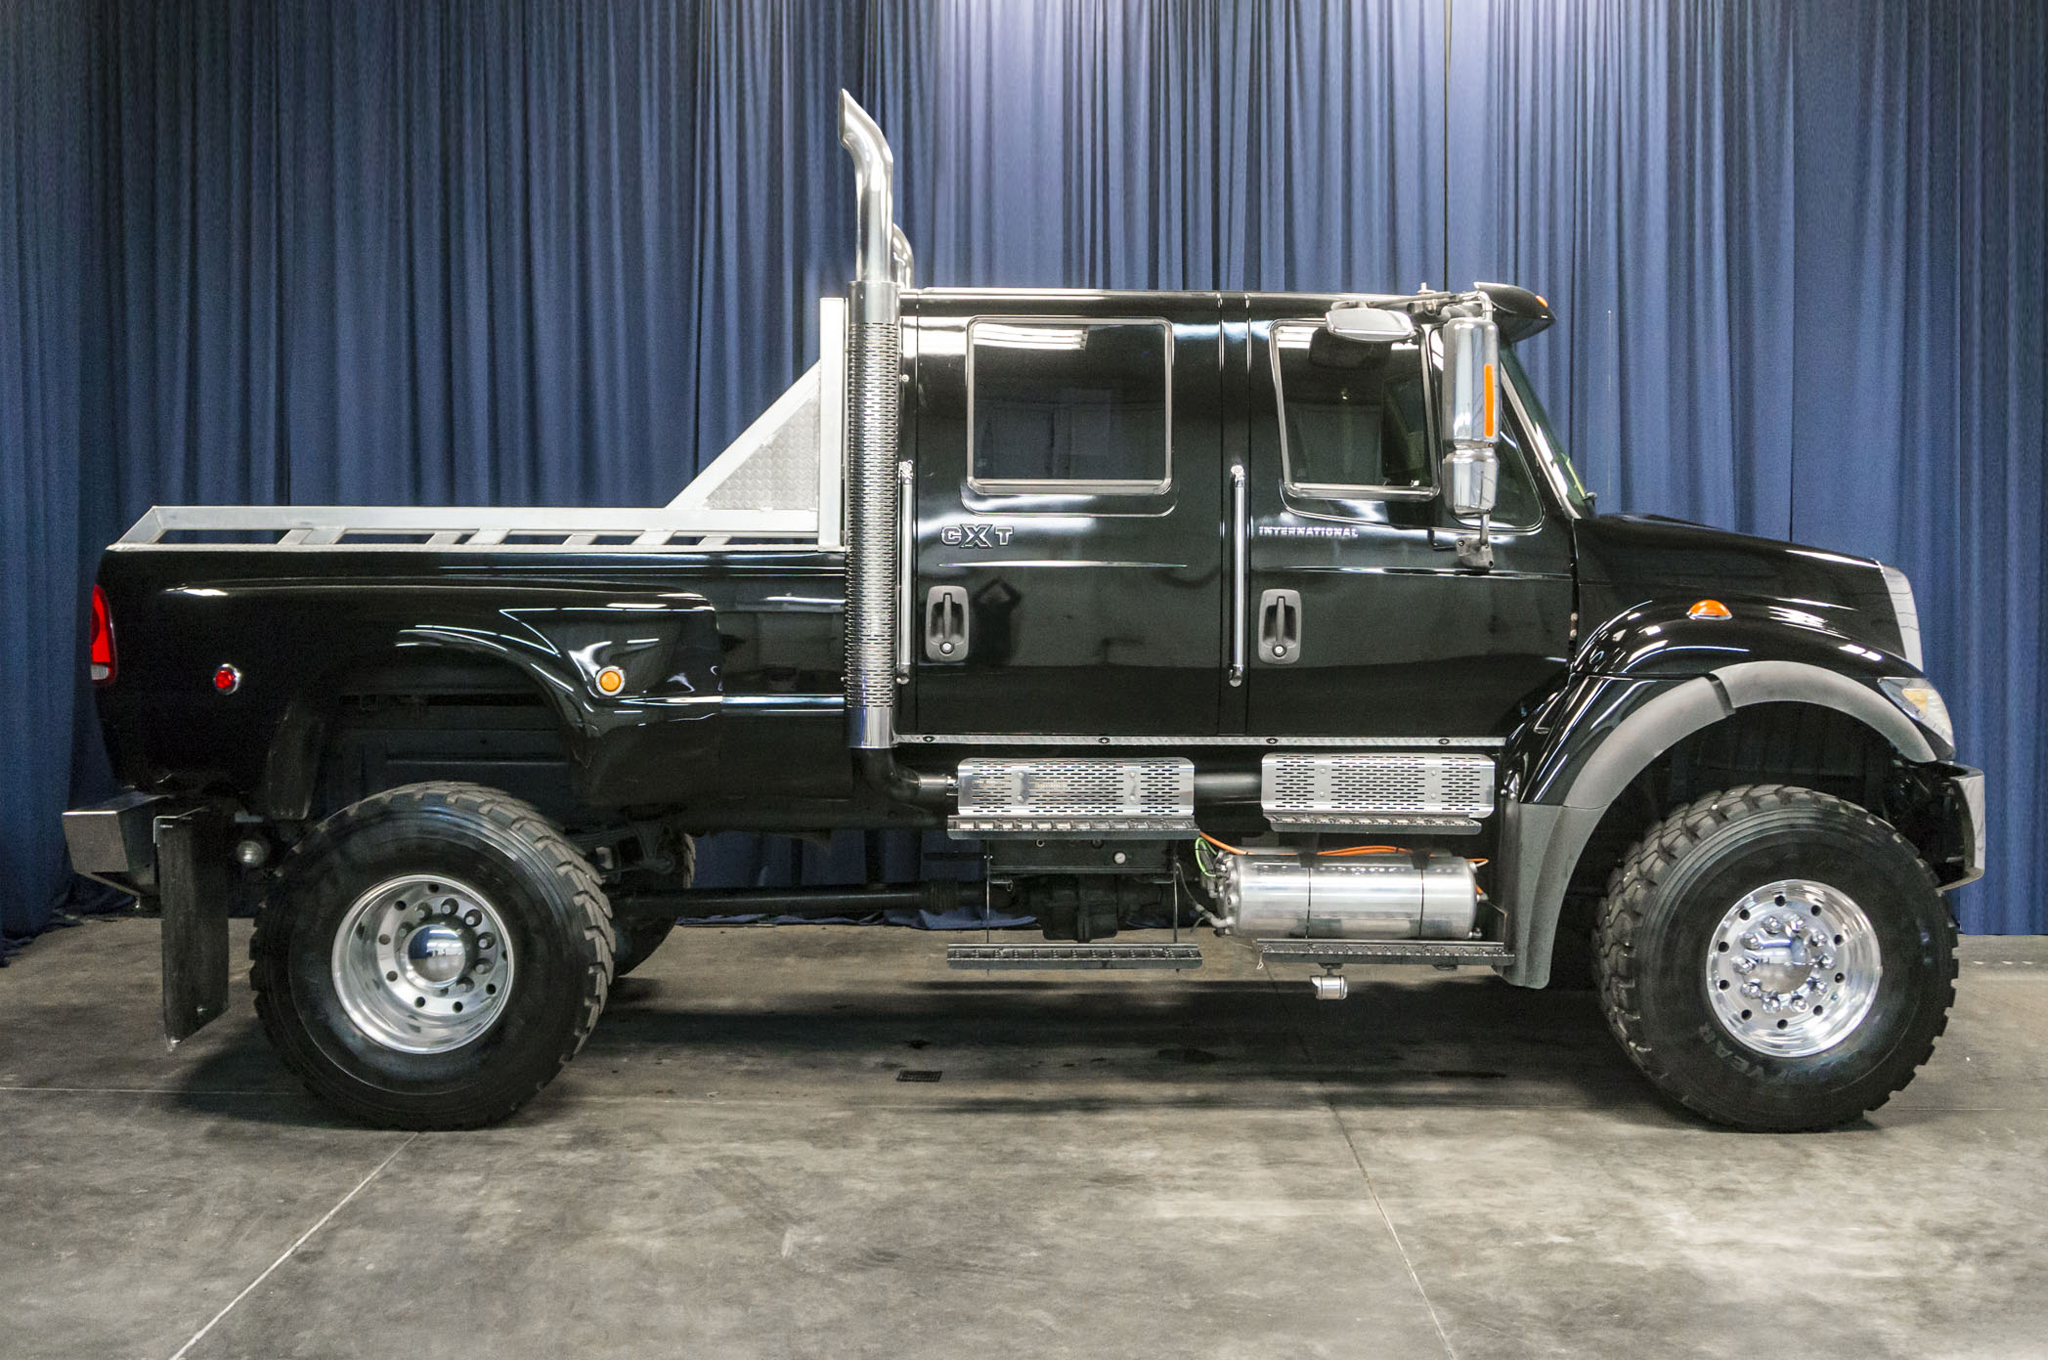 Used Lifted 4x4 Trucks For Sale >> Diesel Trucks | Lifted Trucks | Used Trucks For Sale - Northwest Motorsport